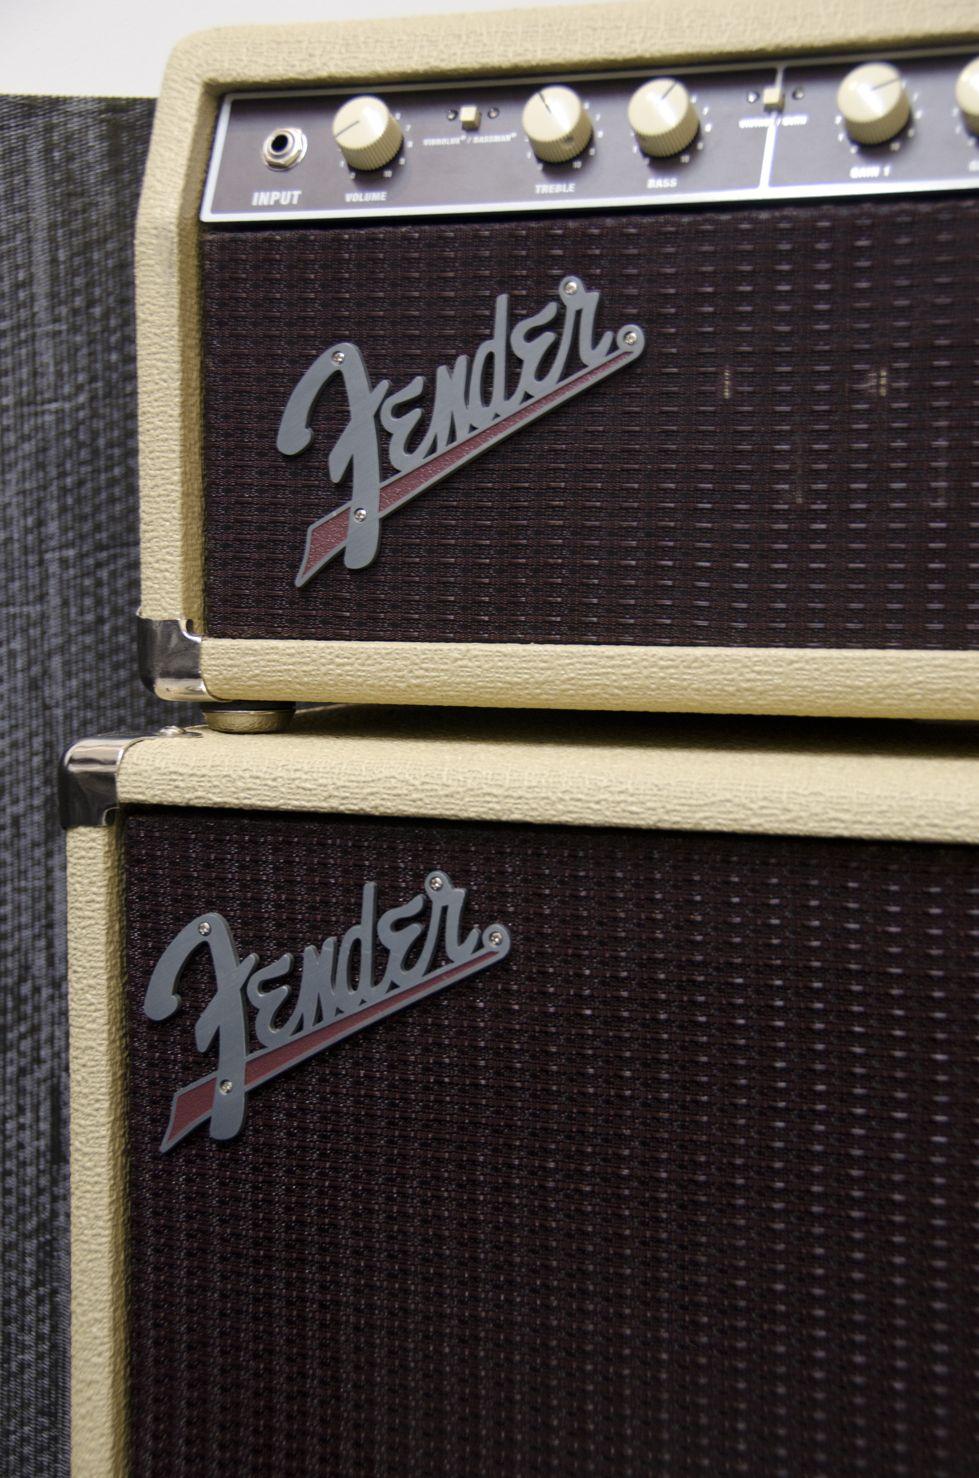 Fender 4x10 Guitar Cabinet Fender Supersonic Blonde Head Fender Supersonic 4x12 Blonde